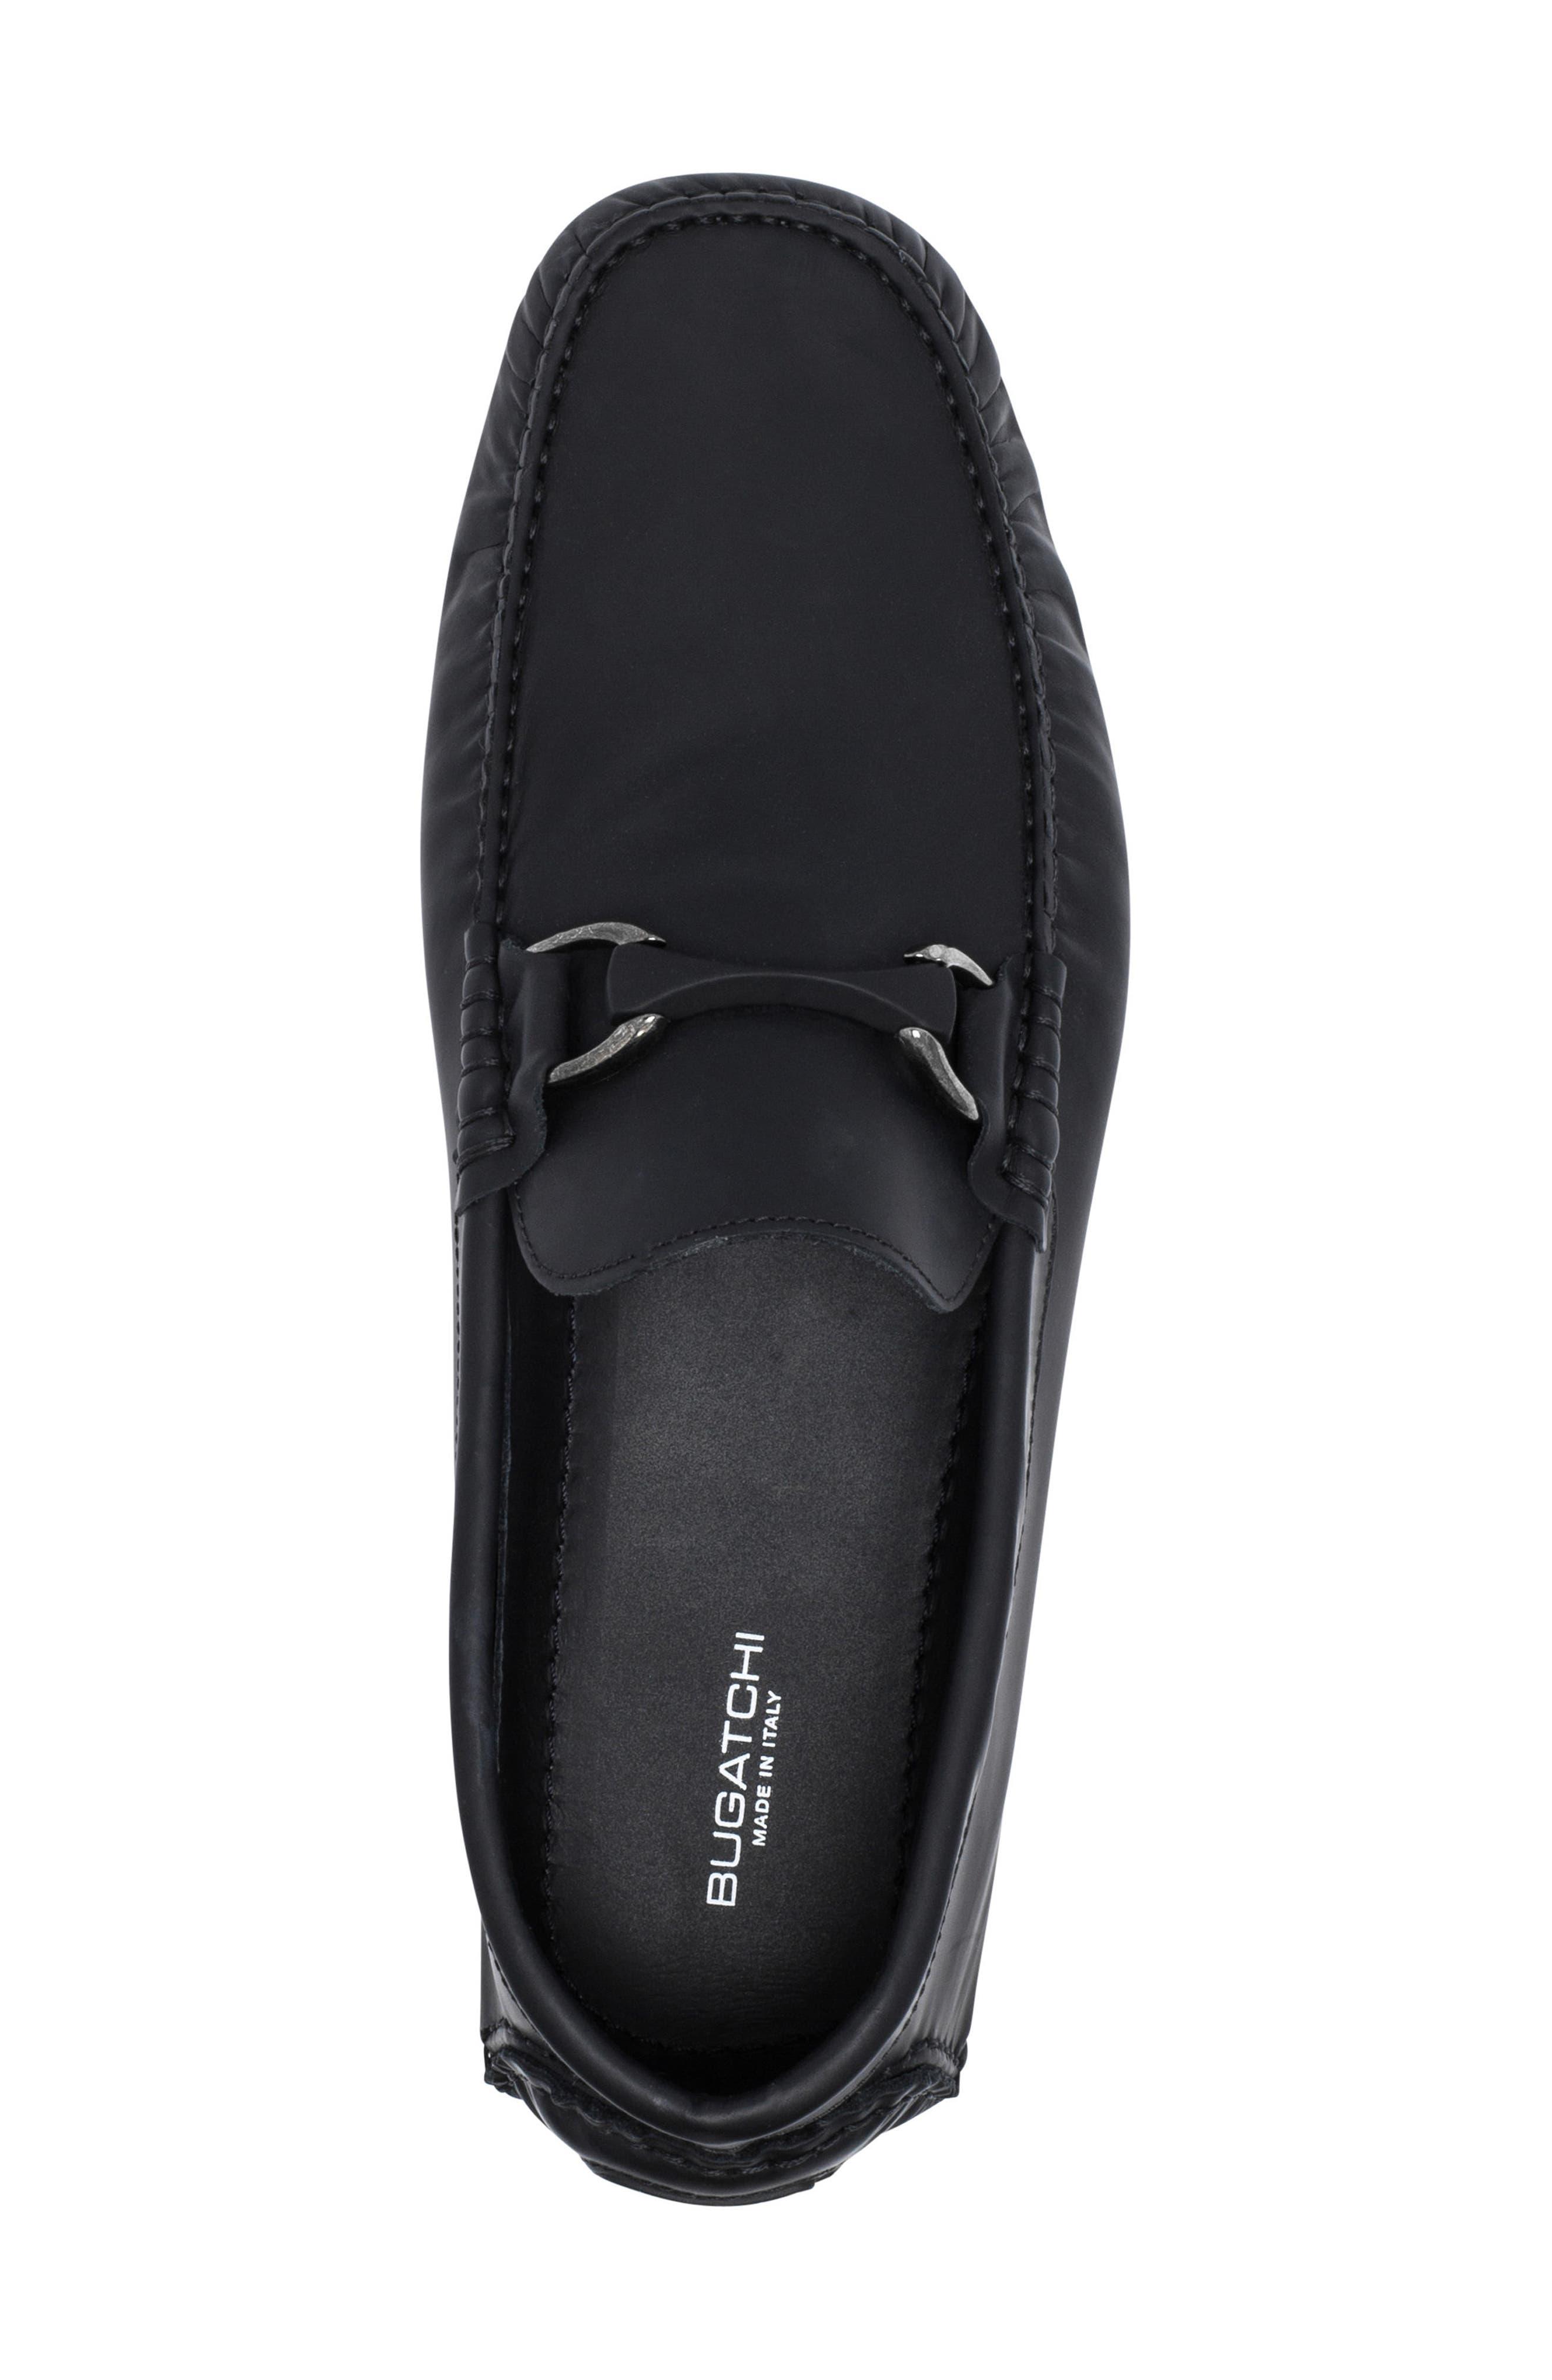 Sanremo Driving Shoe,                             Alternate thumbnail 5, color,                             NERO